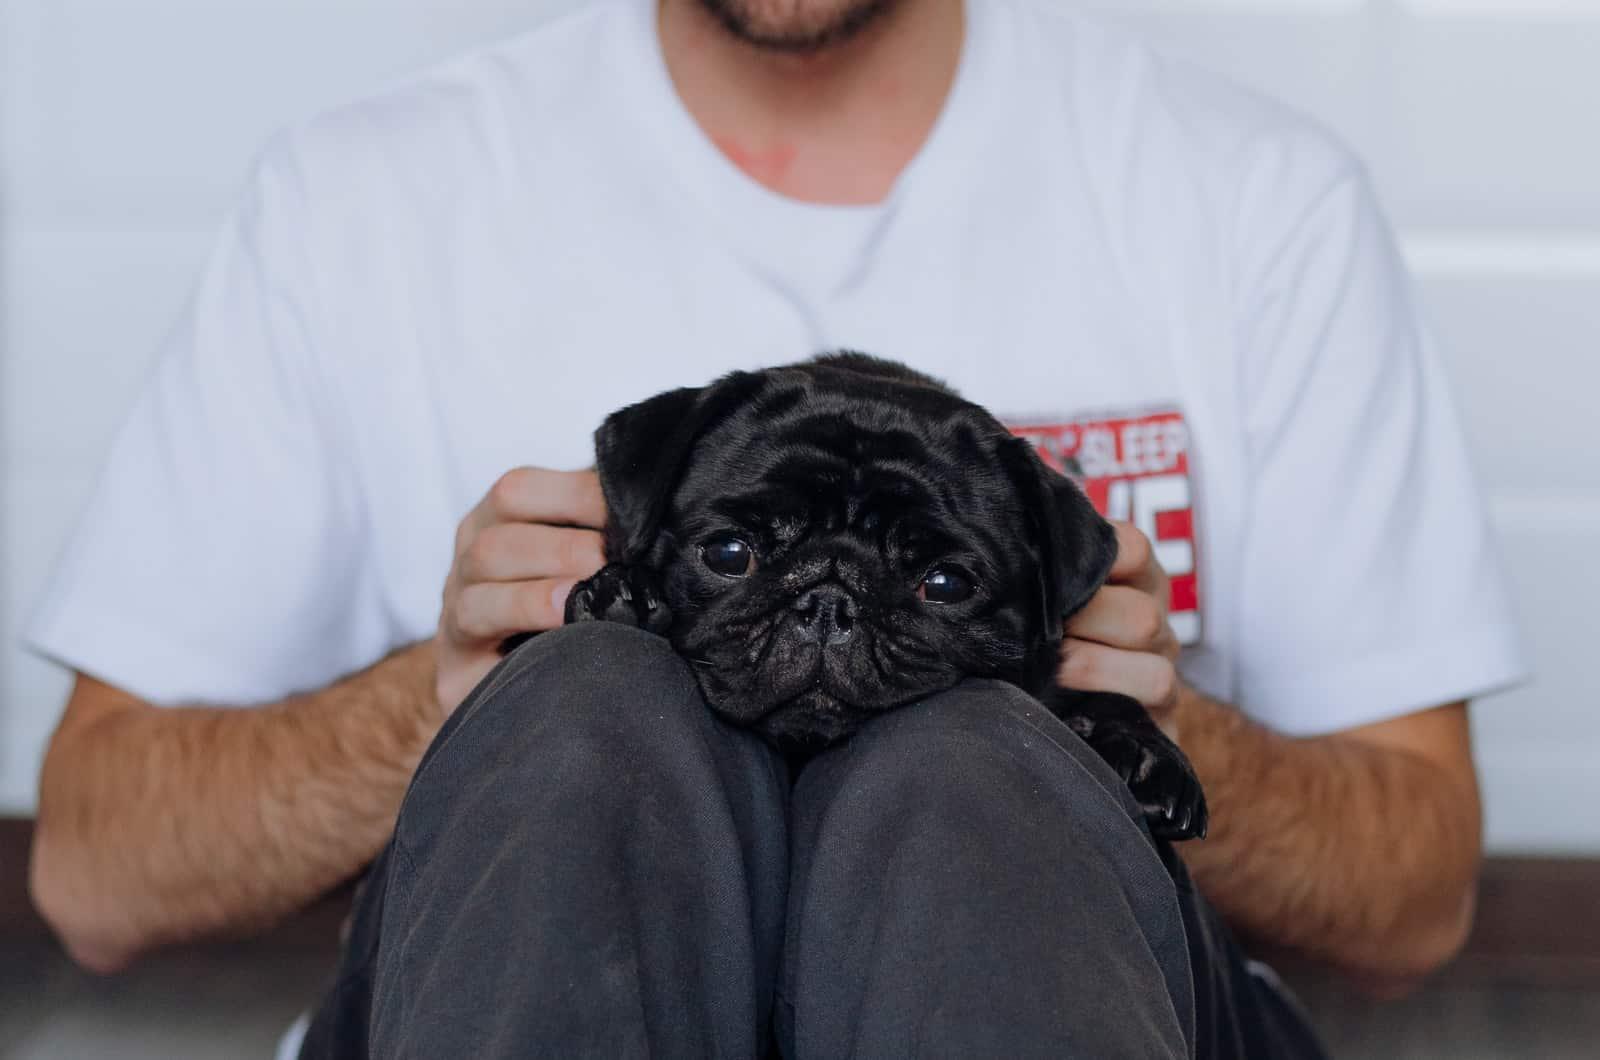 owner holding their black pug